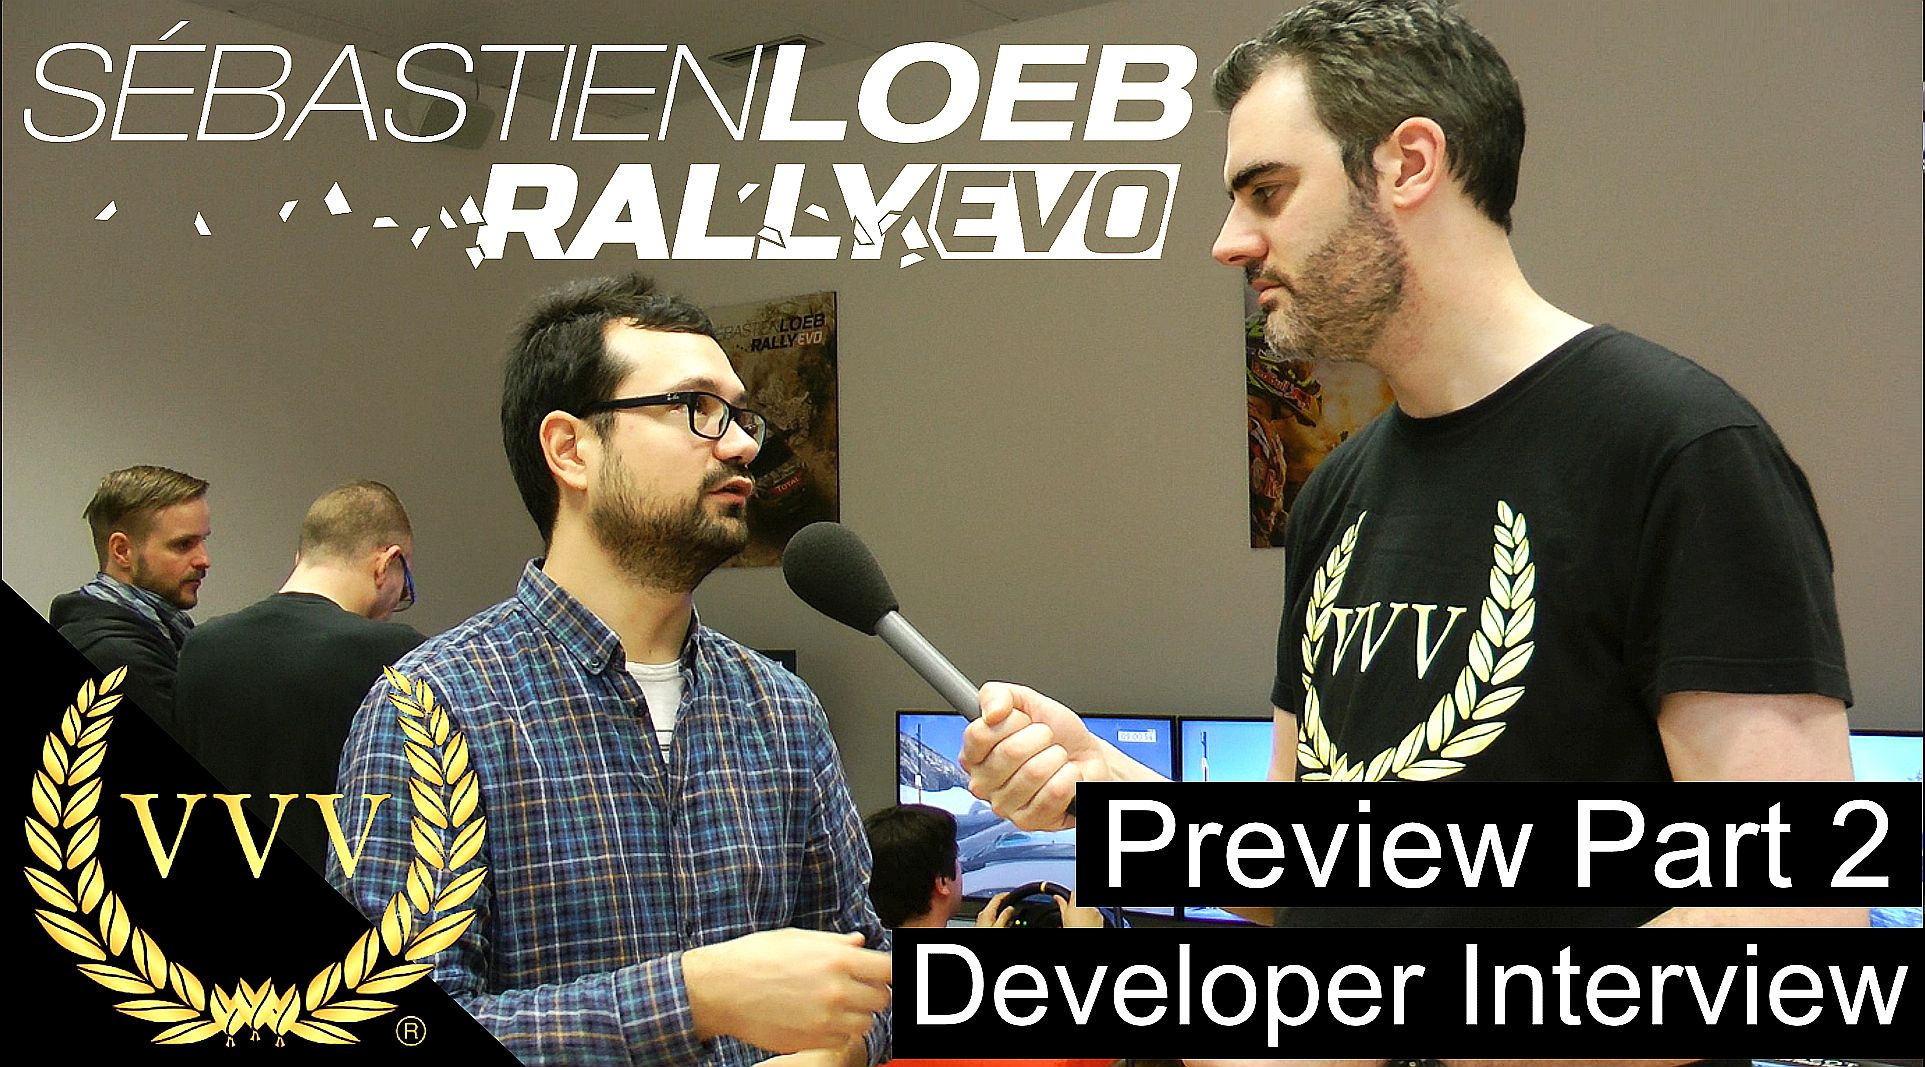 Sebastien Loeb Rally Evo: Preview part 2 Irvin Zonca Interview